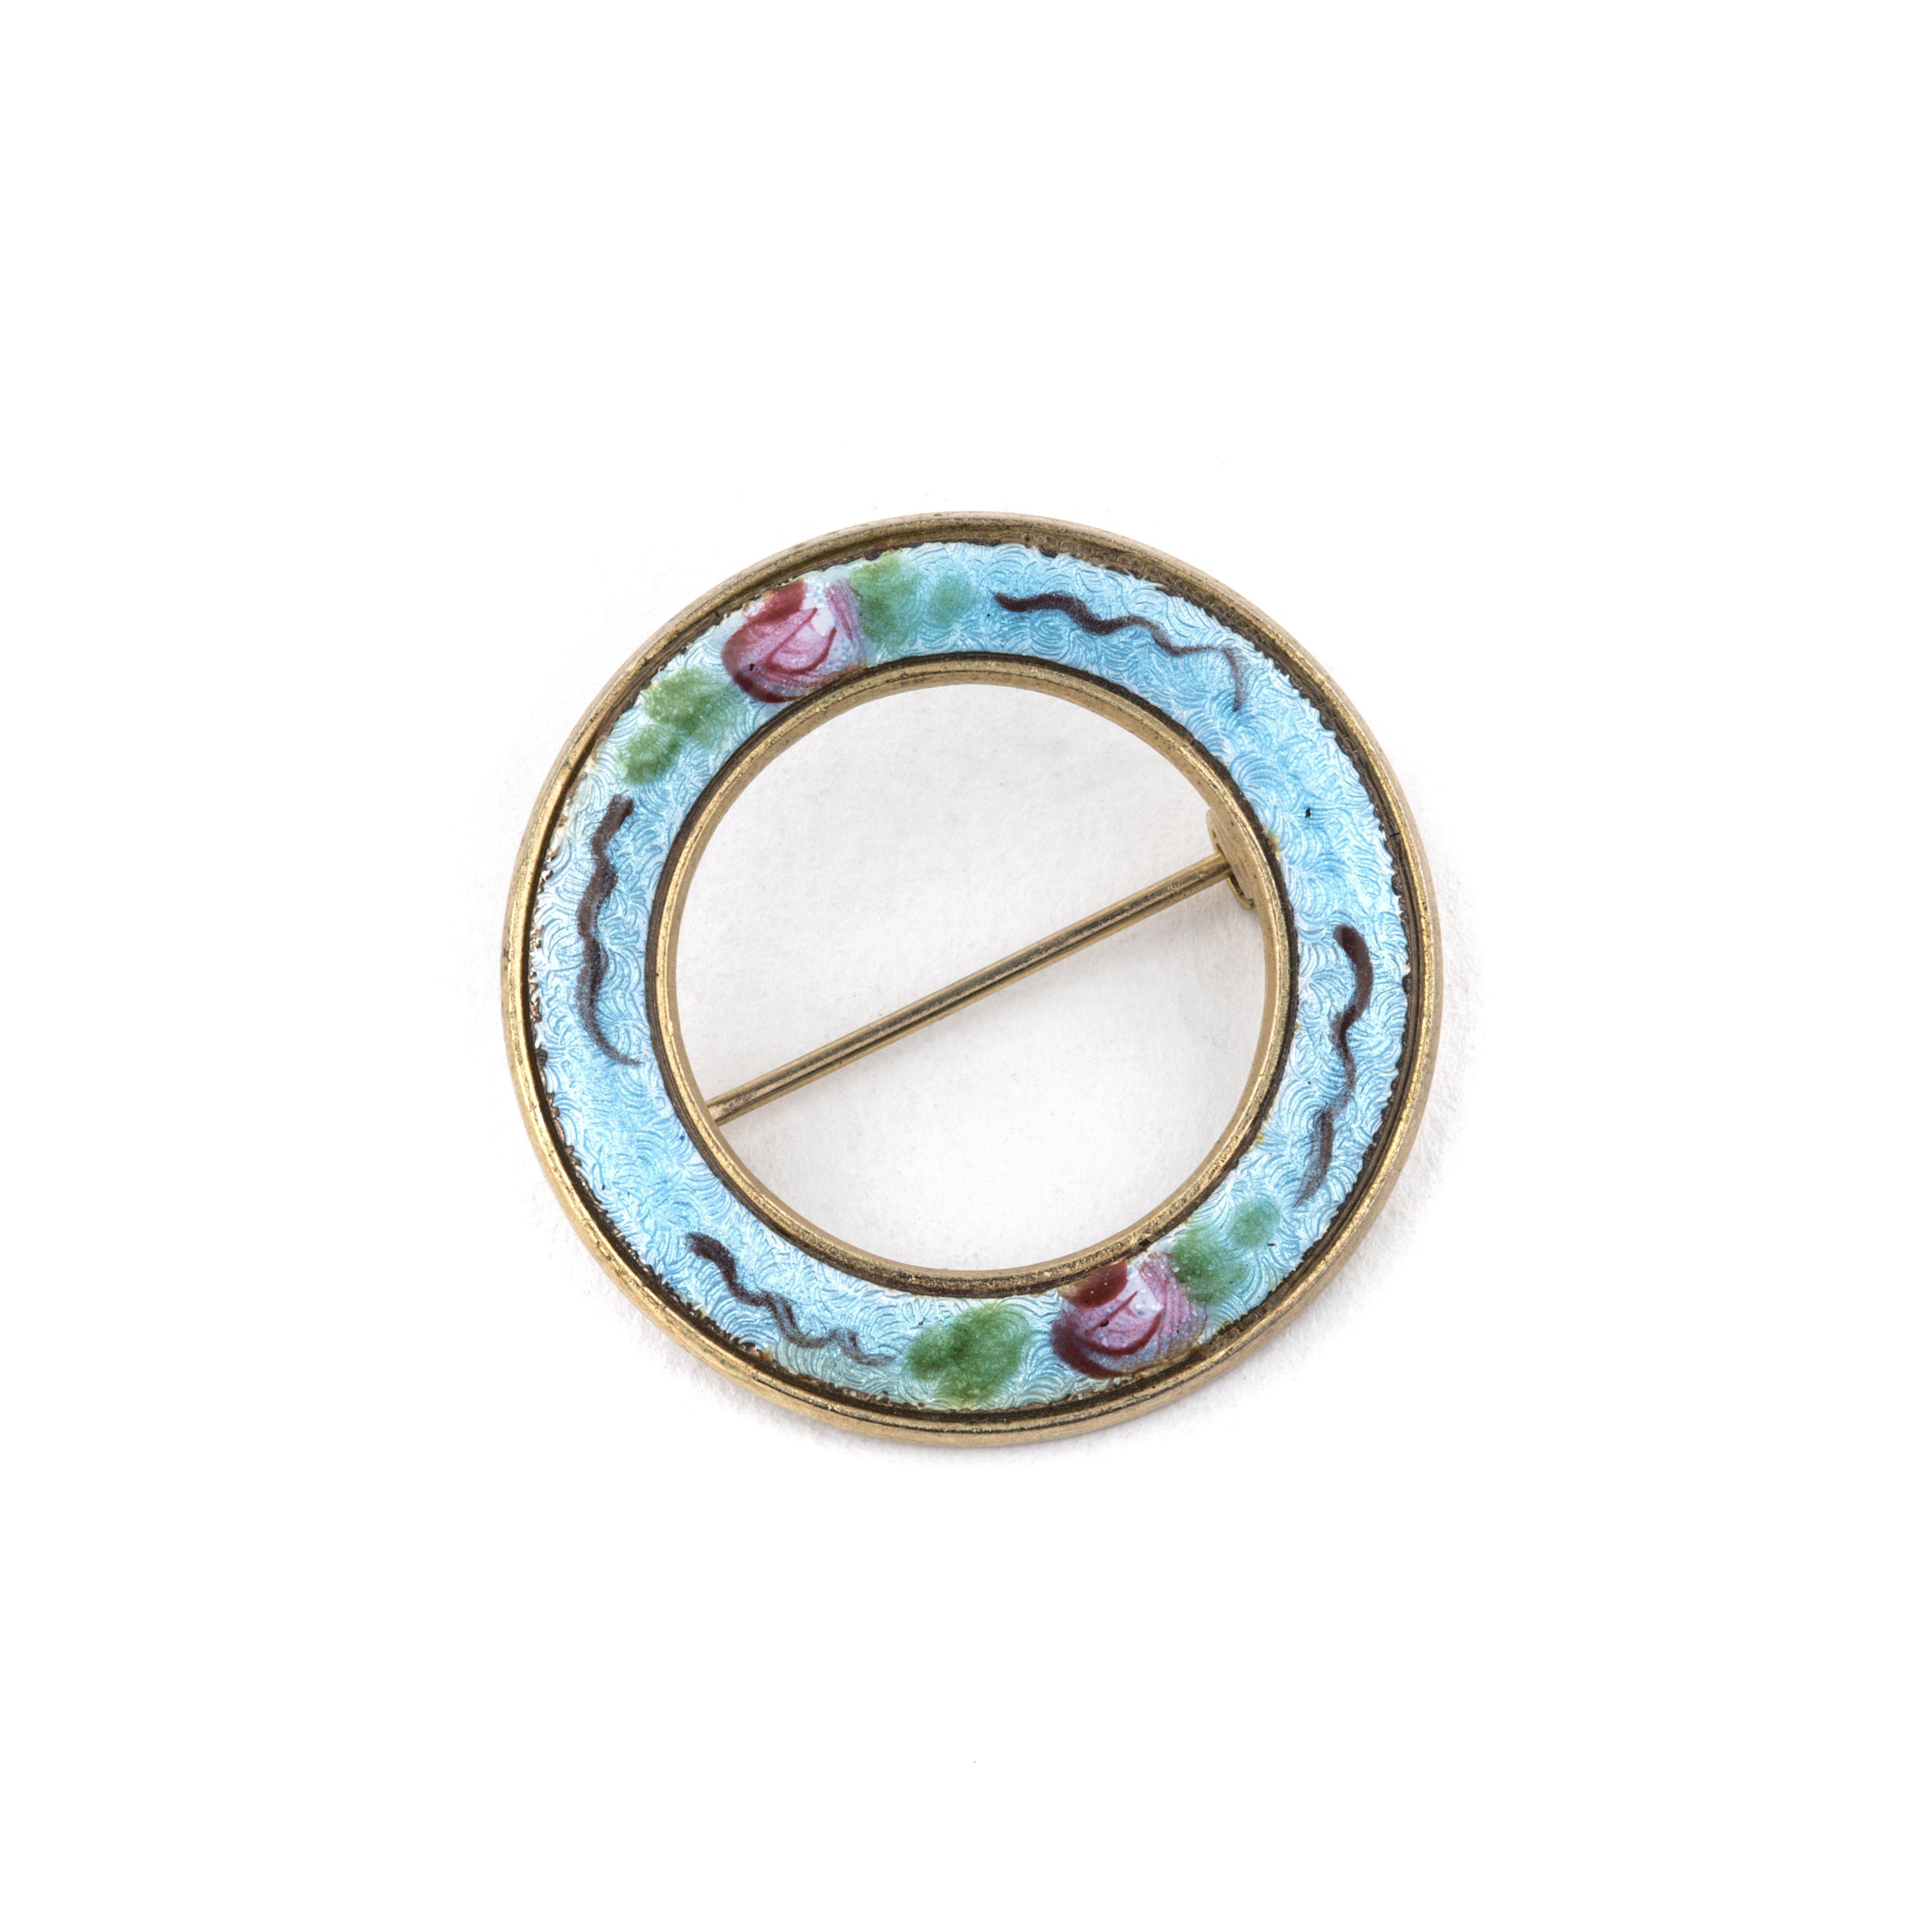 A Vintage Circular Floral Decorated Enamel Pin